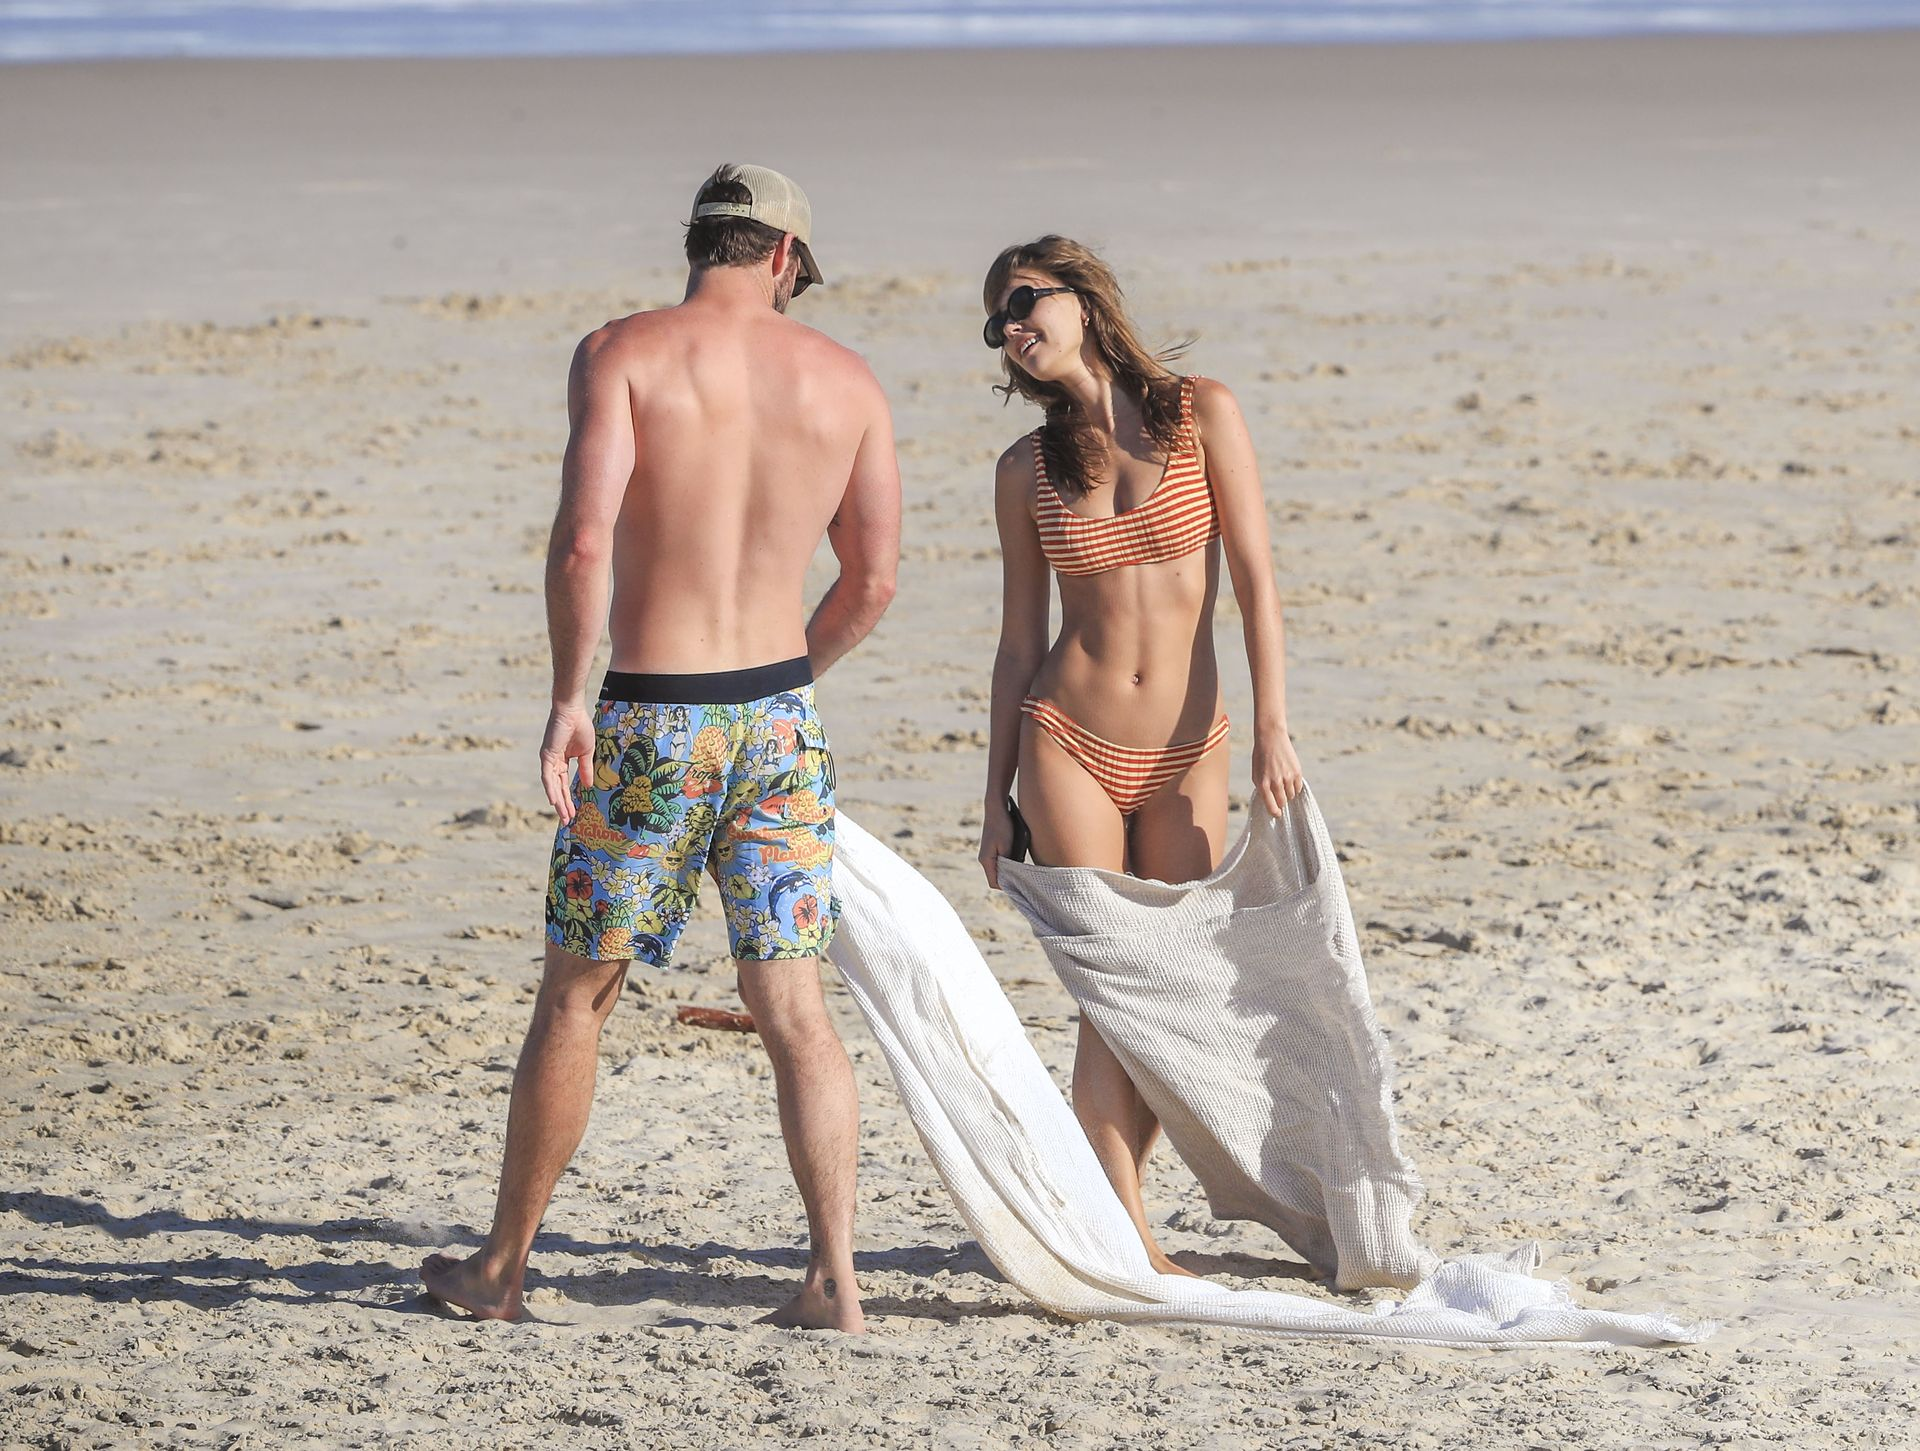 Gabriella Brooks Hot – Liam Hemsworth's New Girlfriend 0058